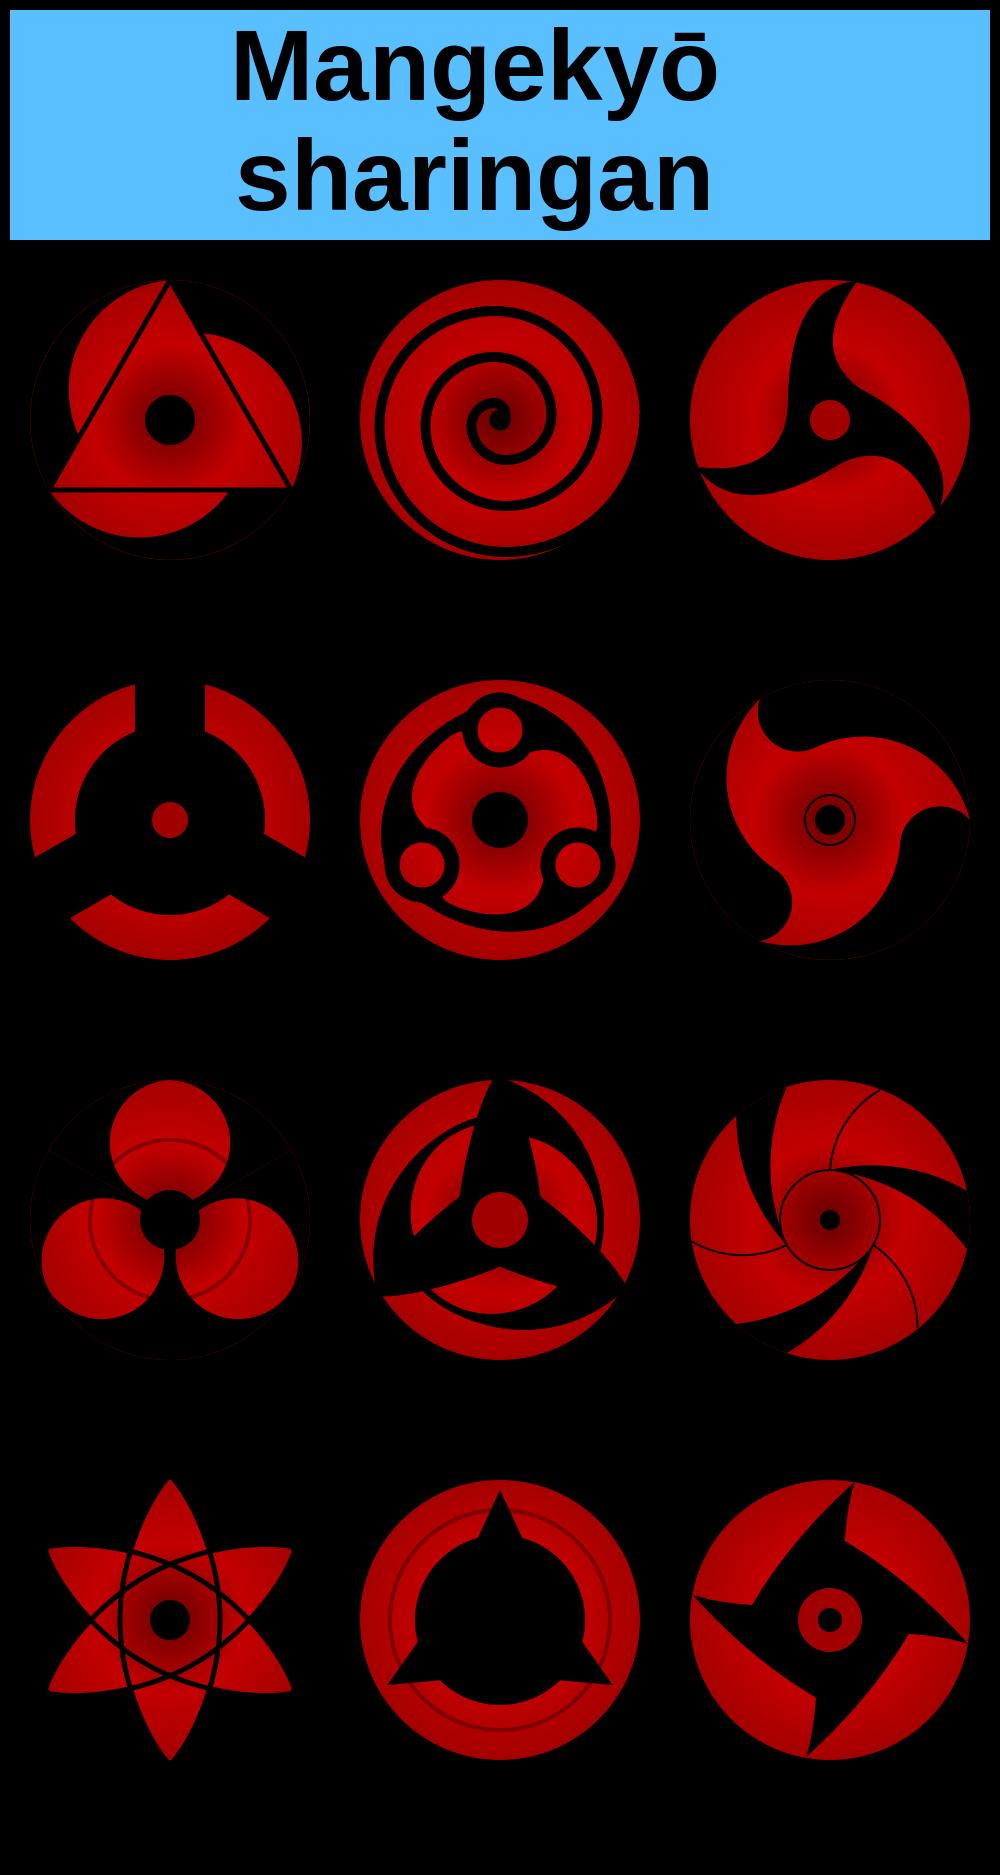 1000px Sharingan Evo 2 Svg Png 1000 1875 Mangekyou Sharingan Kekkei Genkai Naruto Kakashi